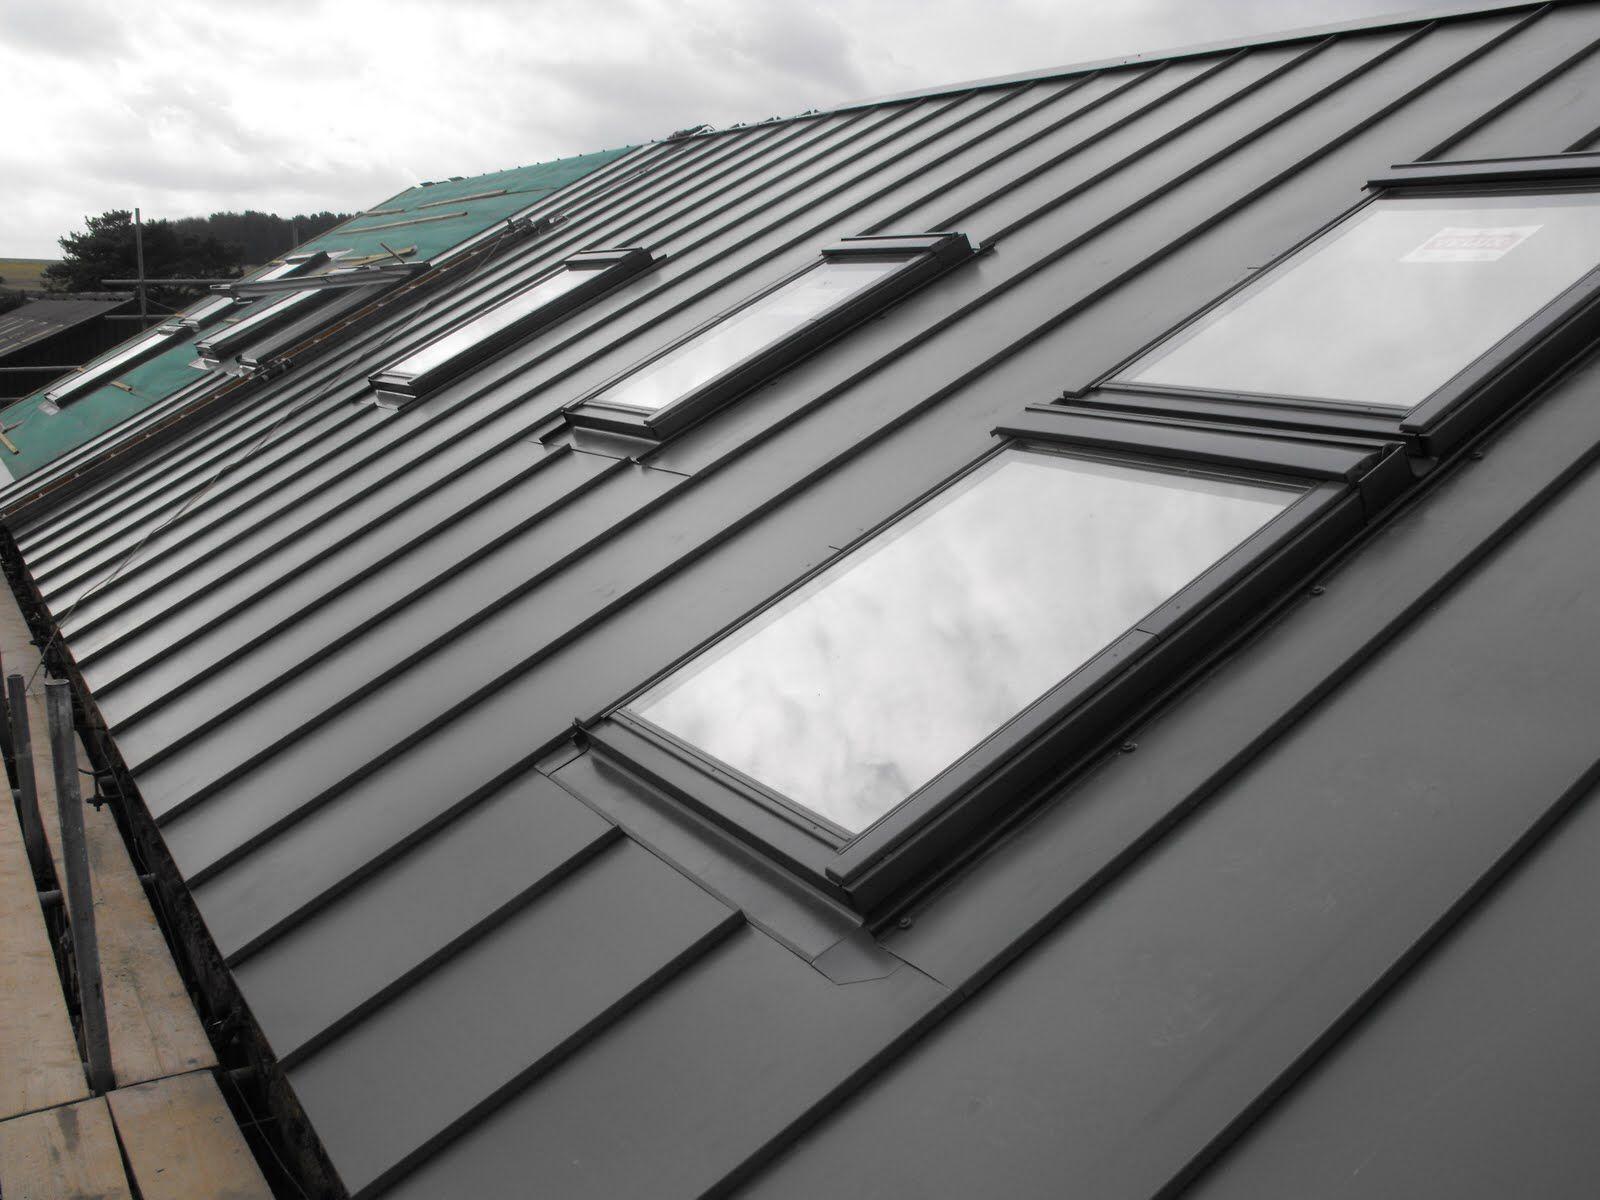 Metal Roof With Velux Window Home Exteriors Zinc Roof